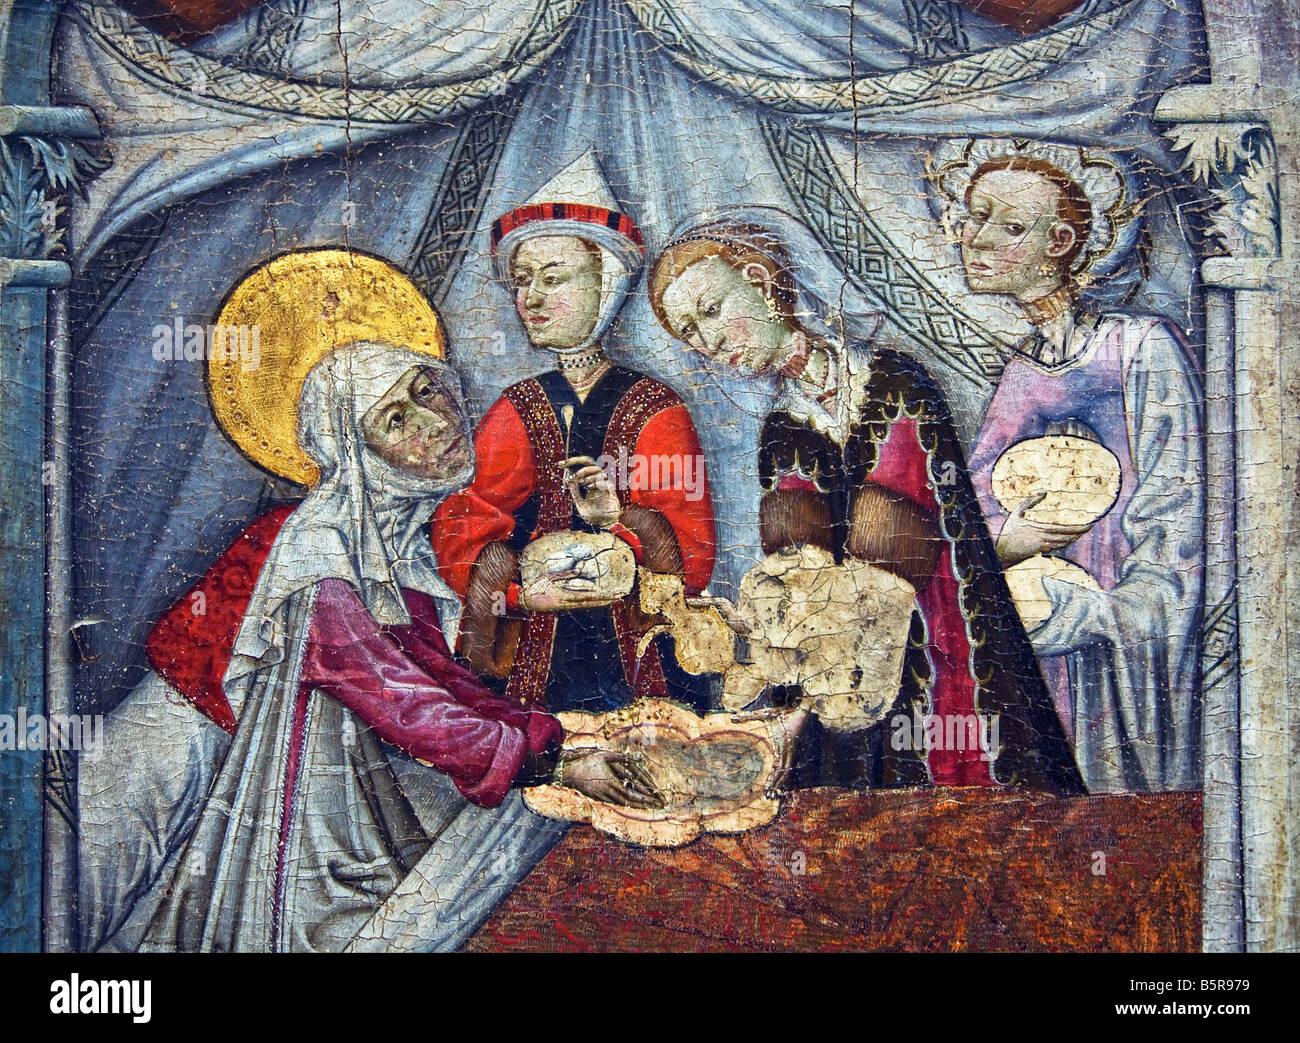 'Birth of the Virgin' circa 1430 15th century Aragonese School  interior Lady Lever Gallery Port Sunlight - Stock Image